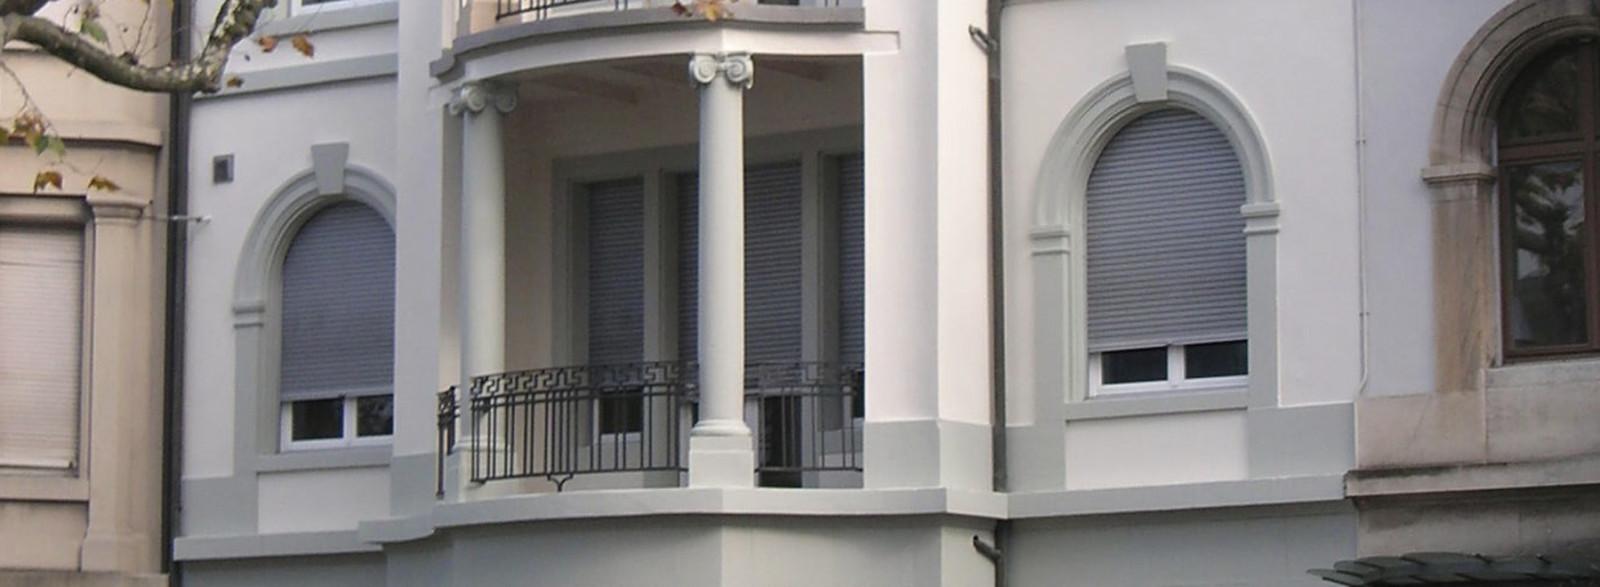 Fassade_3